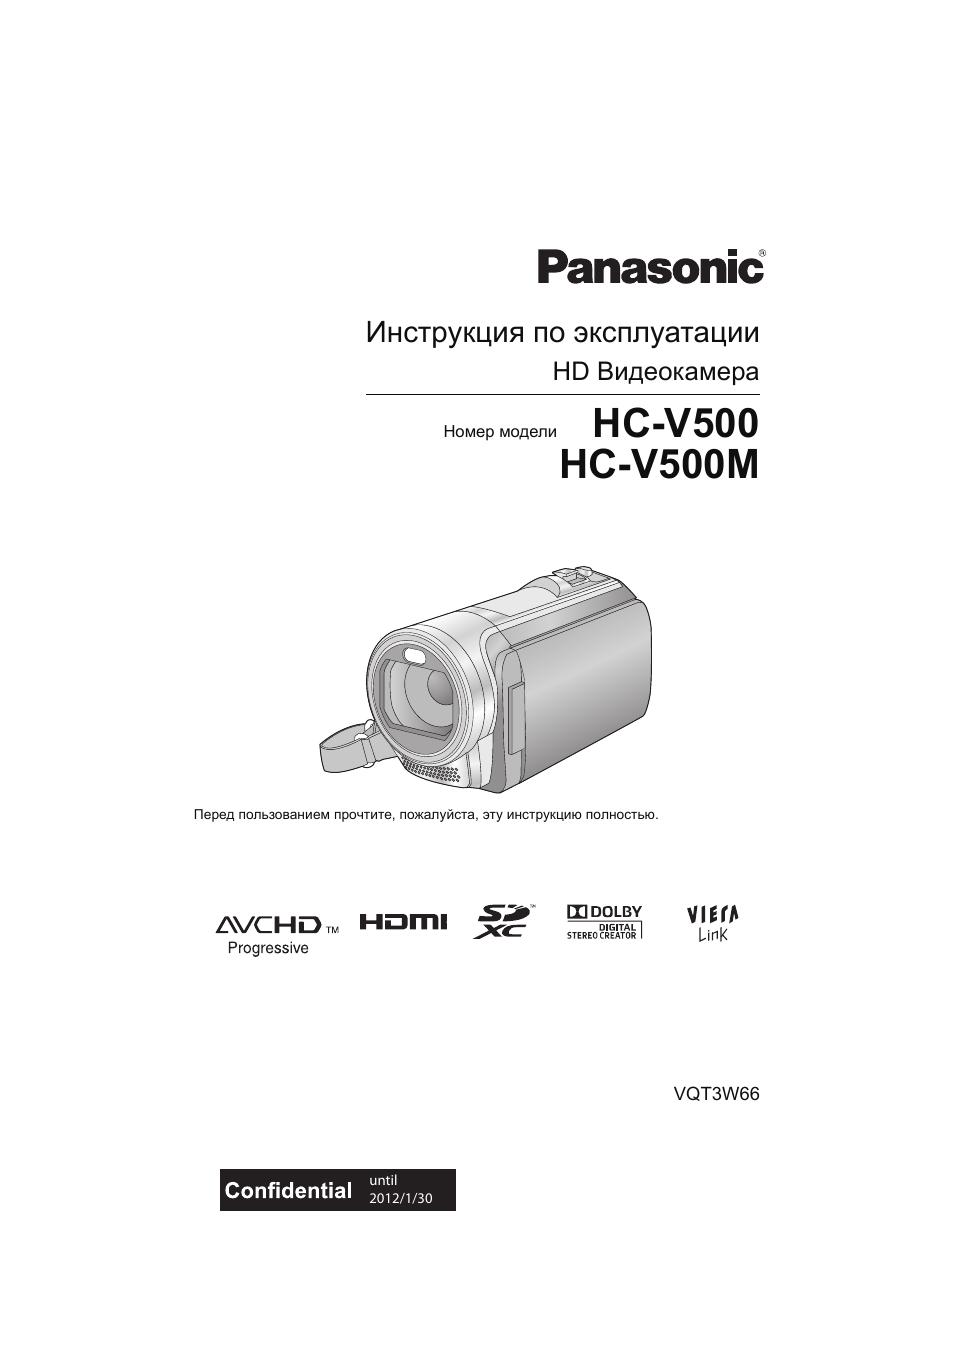 Panasonic hc v500m manual focus test youtube.